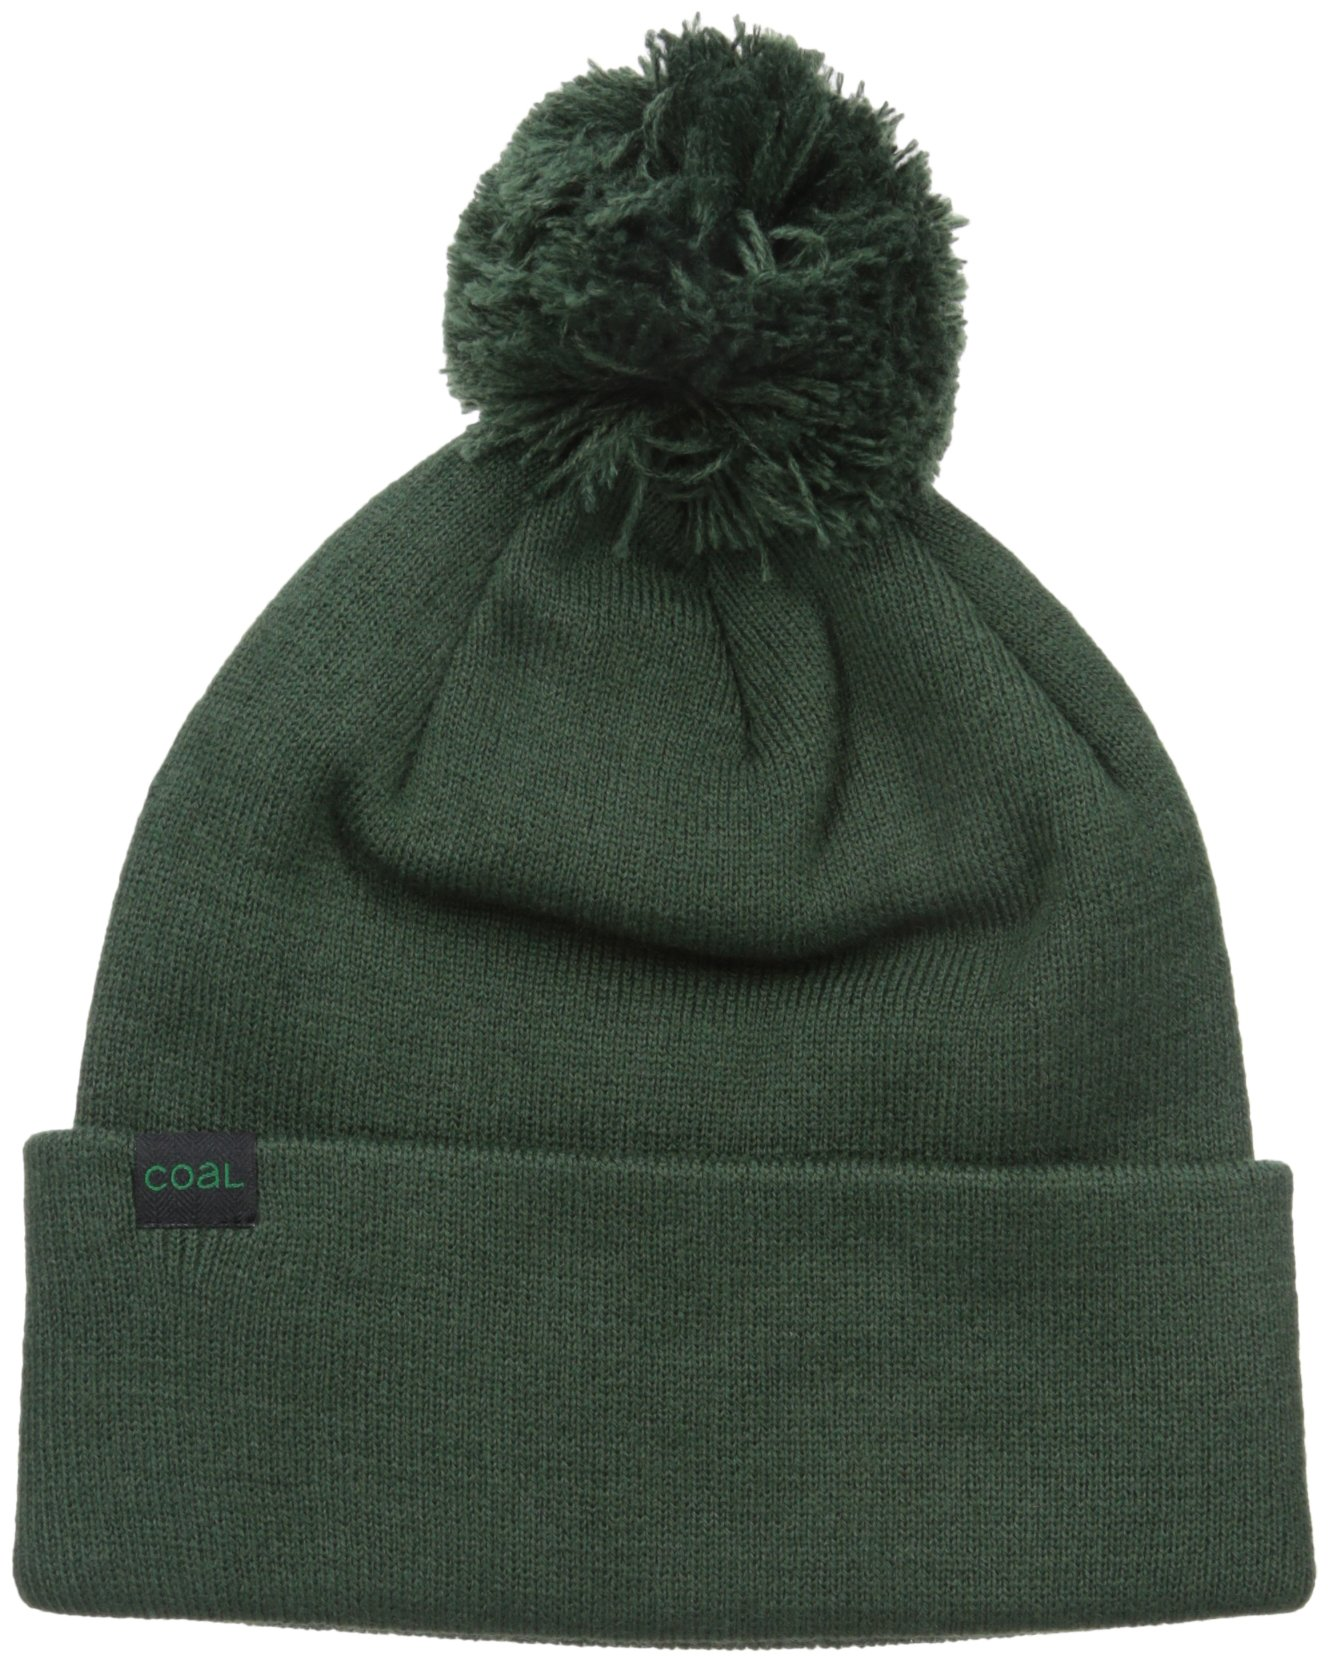 Coal Men's The Pablo Fine Knit Beanie Cuffed Hat Pom, Hunter Green, One Size